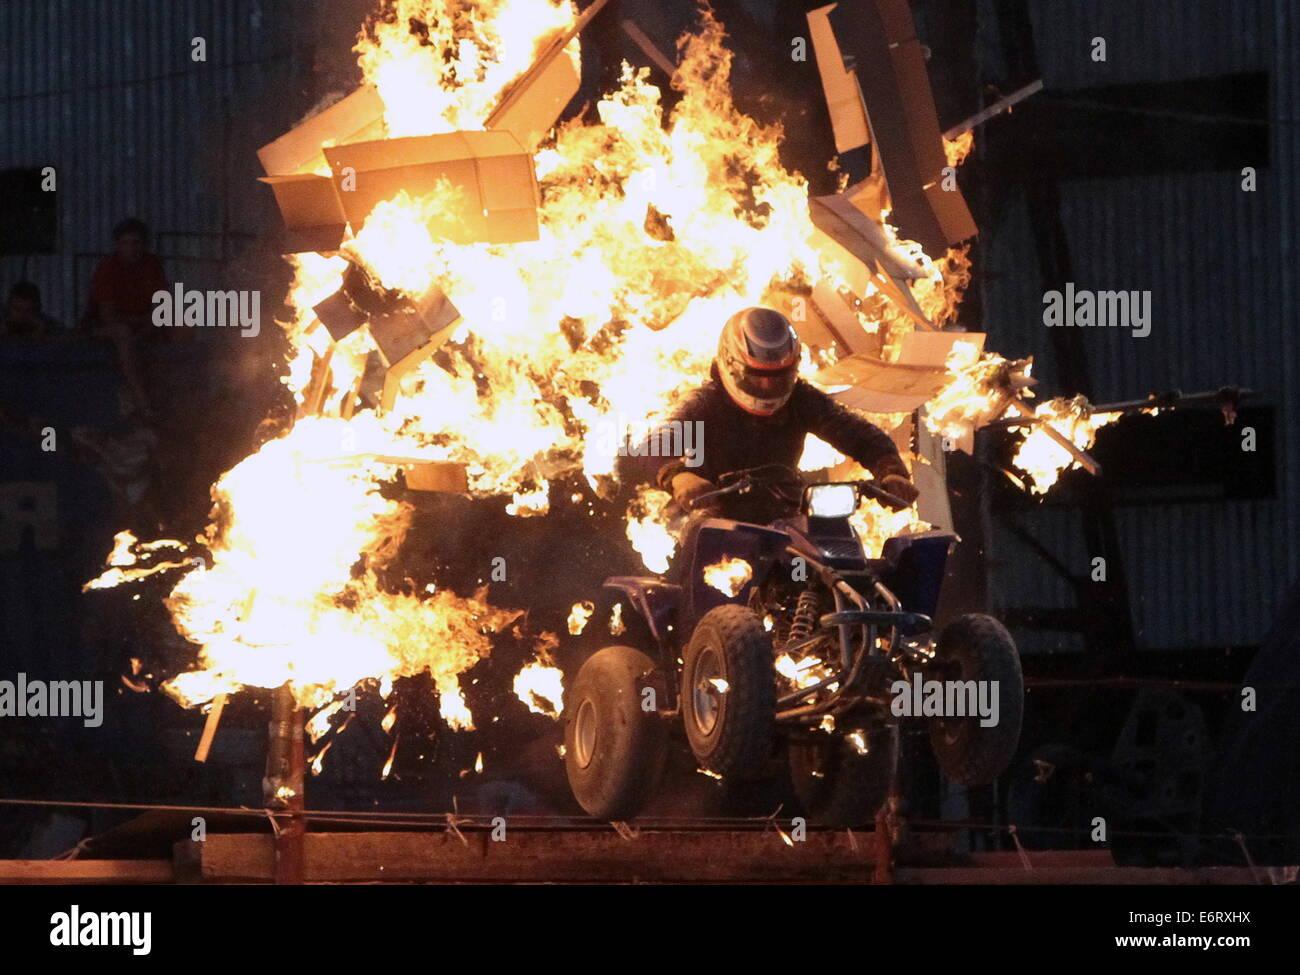 Sevastopol, Russia. 29th Aug, 2014. A stuntman performs during Prometey [Prometheus] international festival of stunts - Stock Image